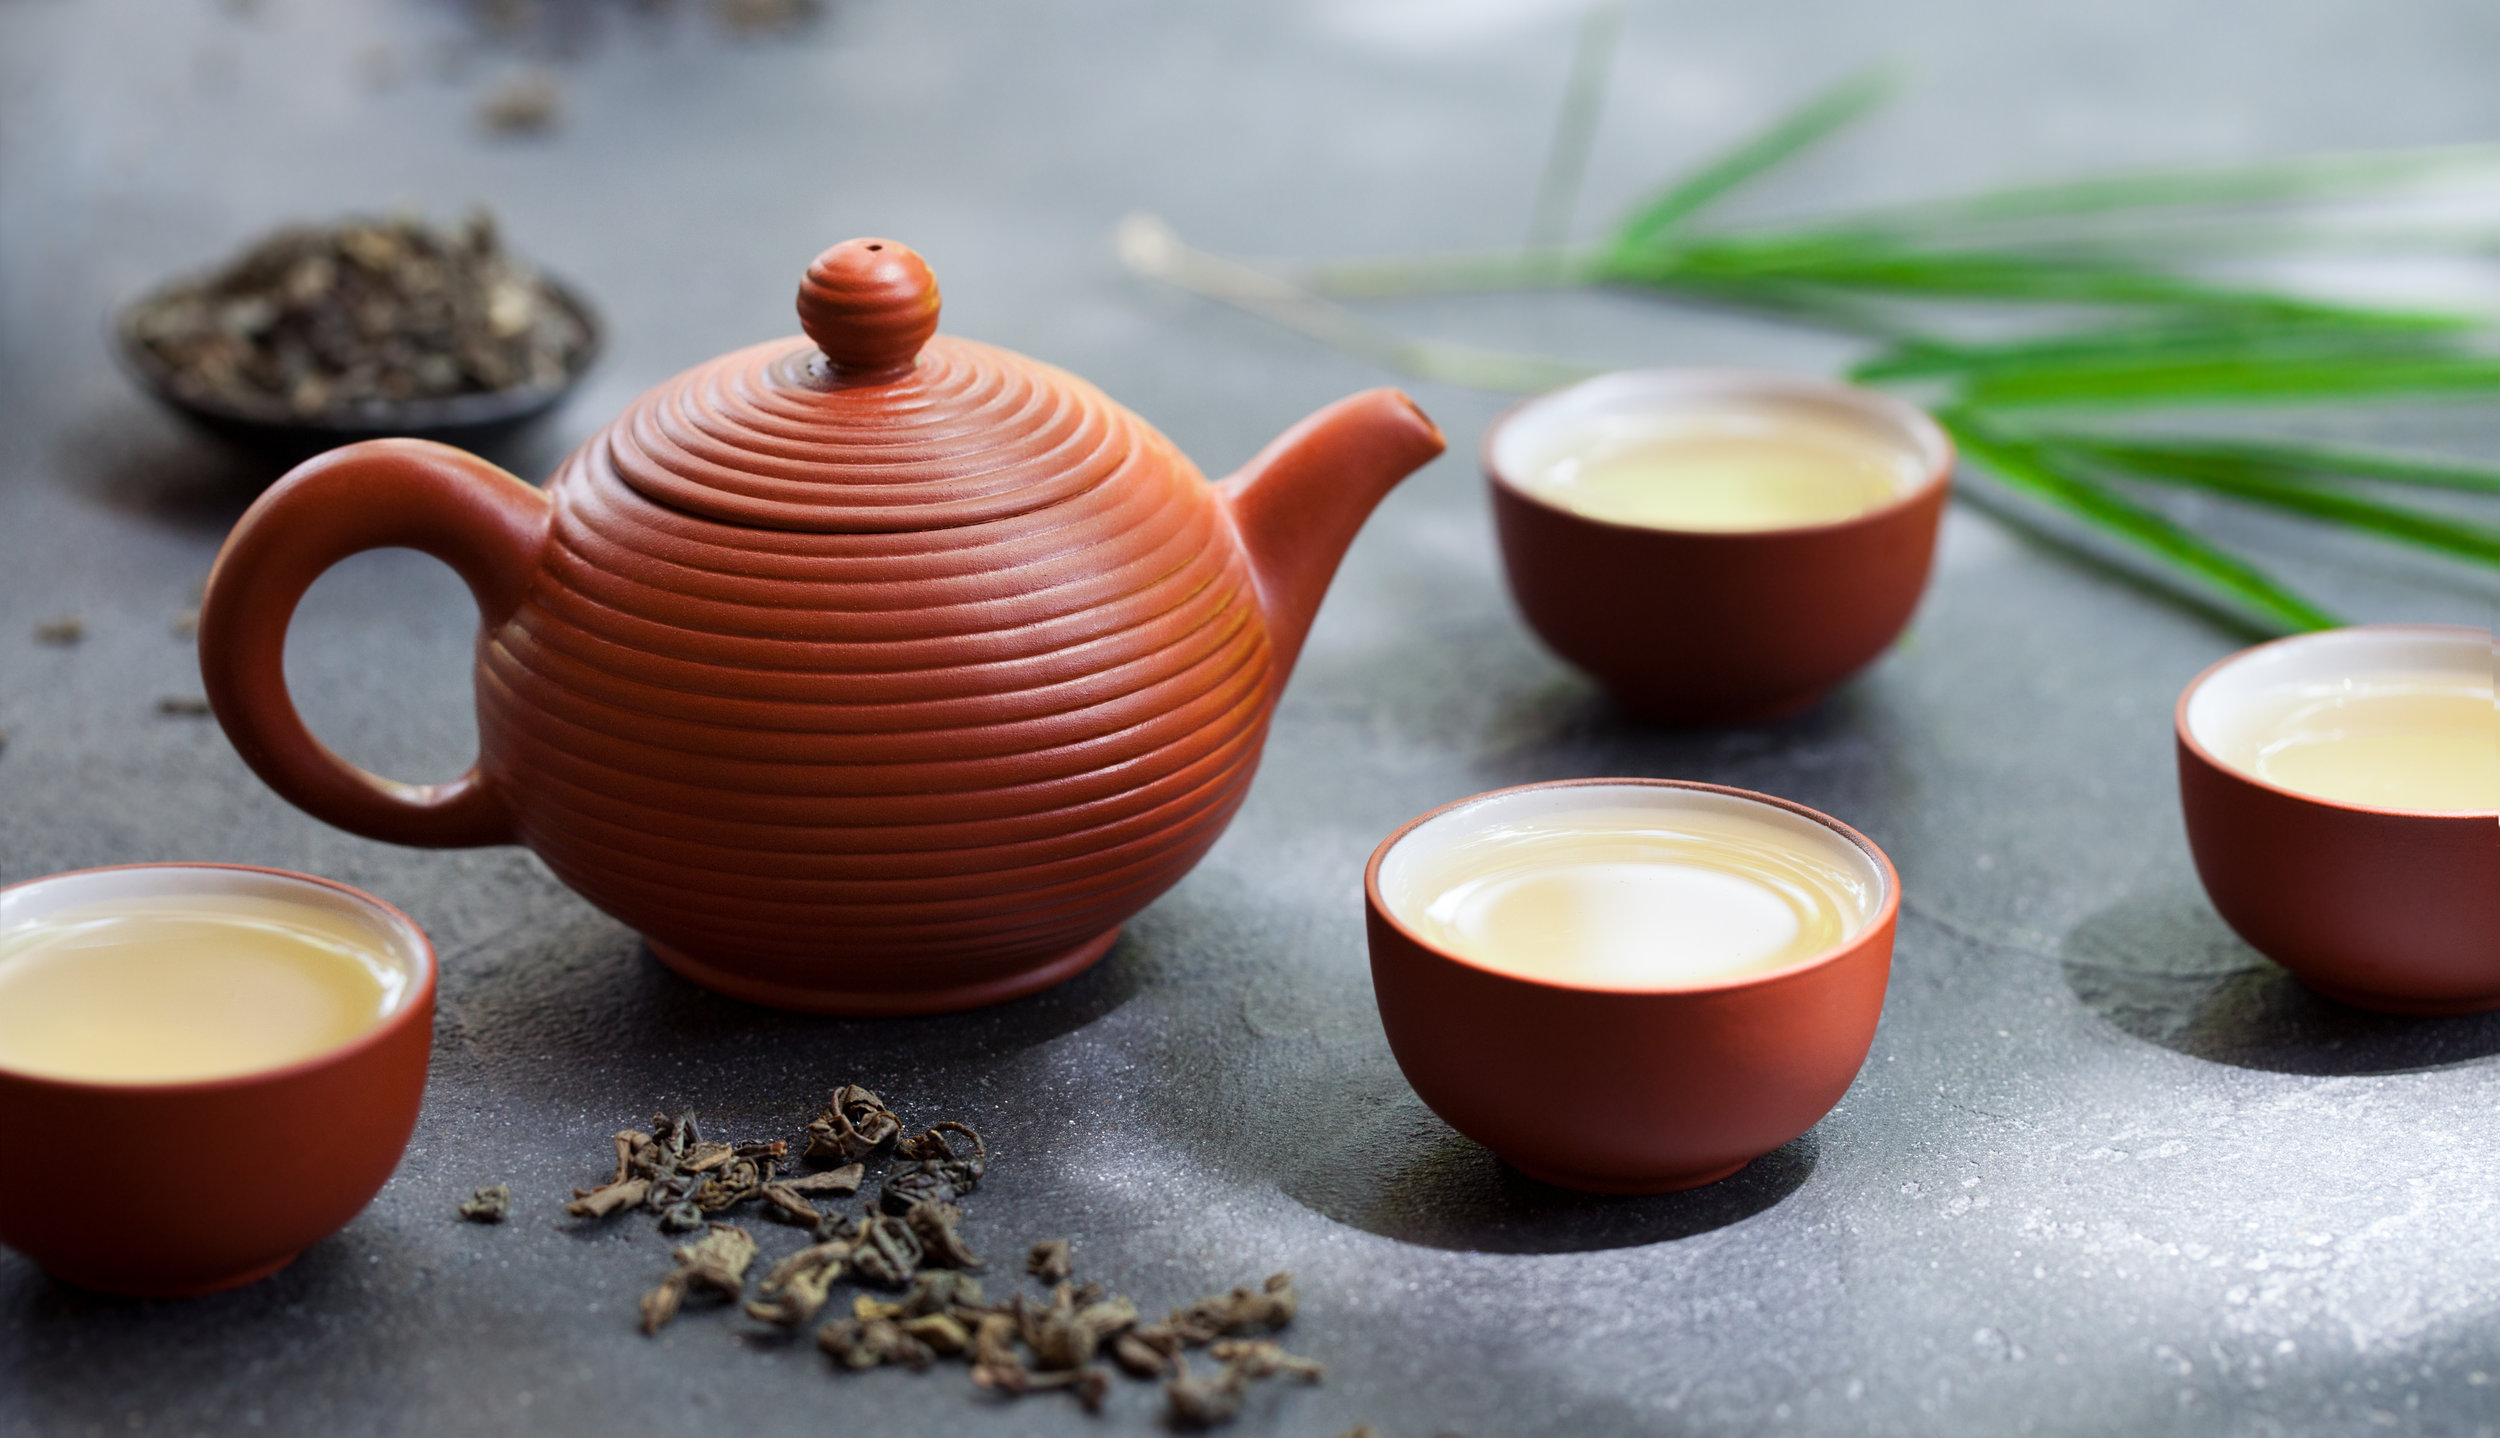 green-tea-in-tea-pot-and-bowls-cups-on-slate-3WEGYTP.jpg